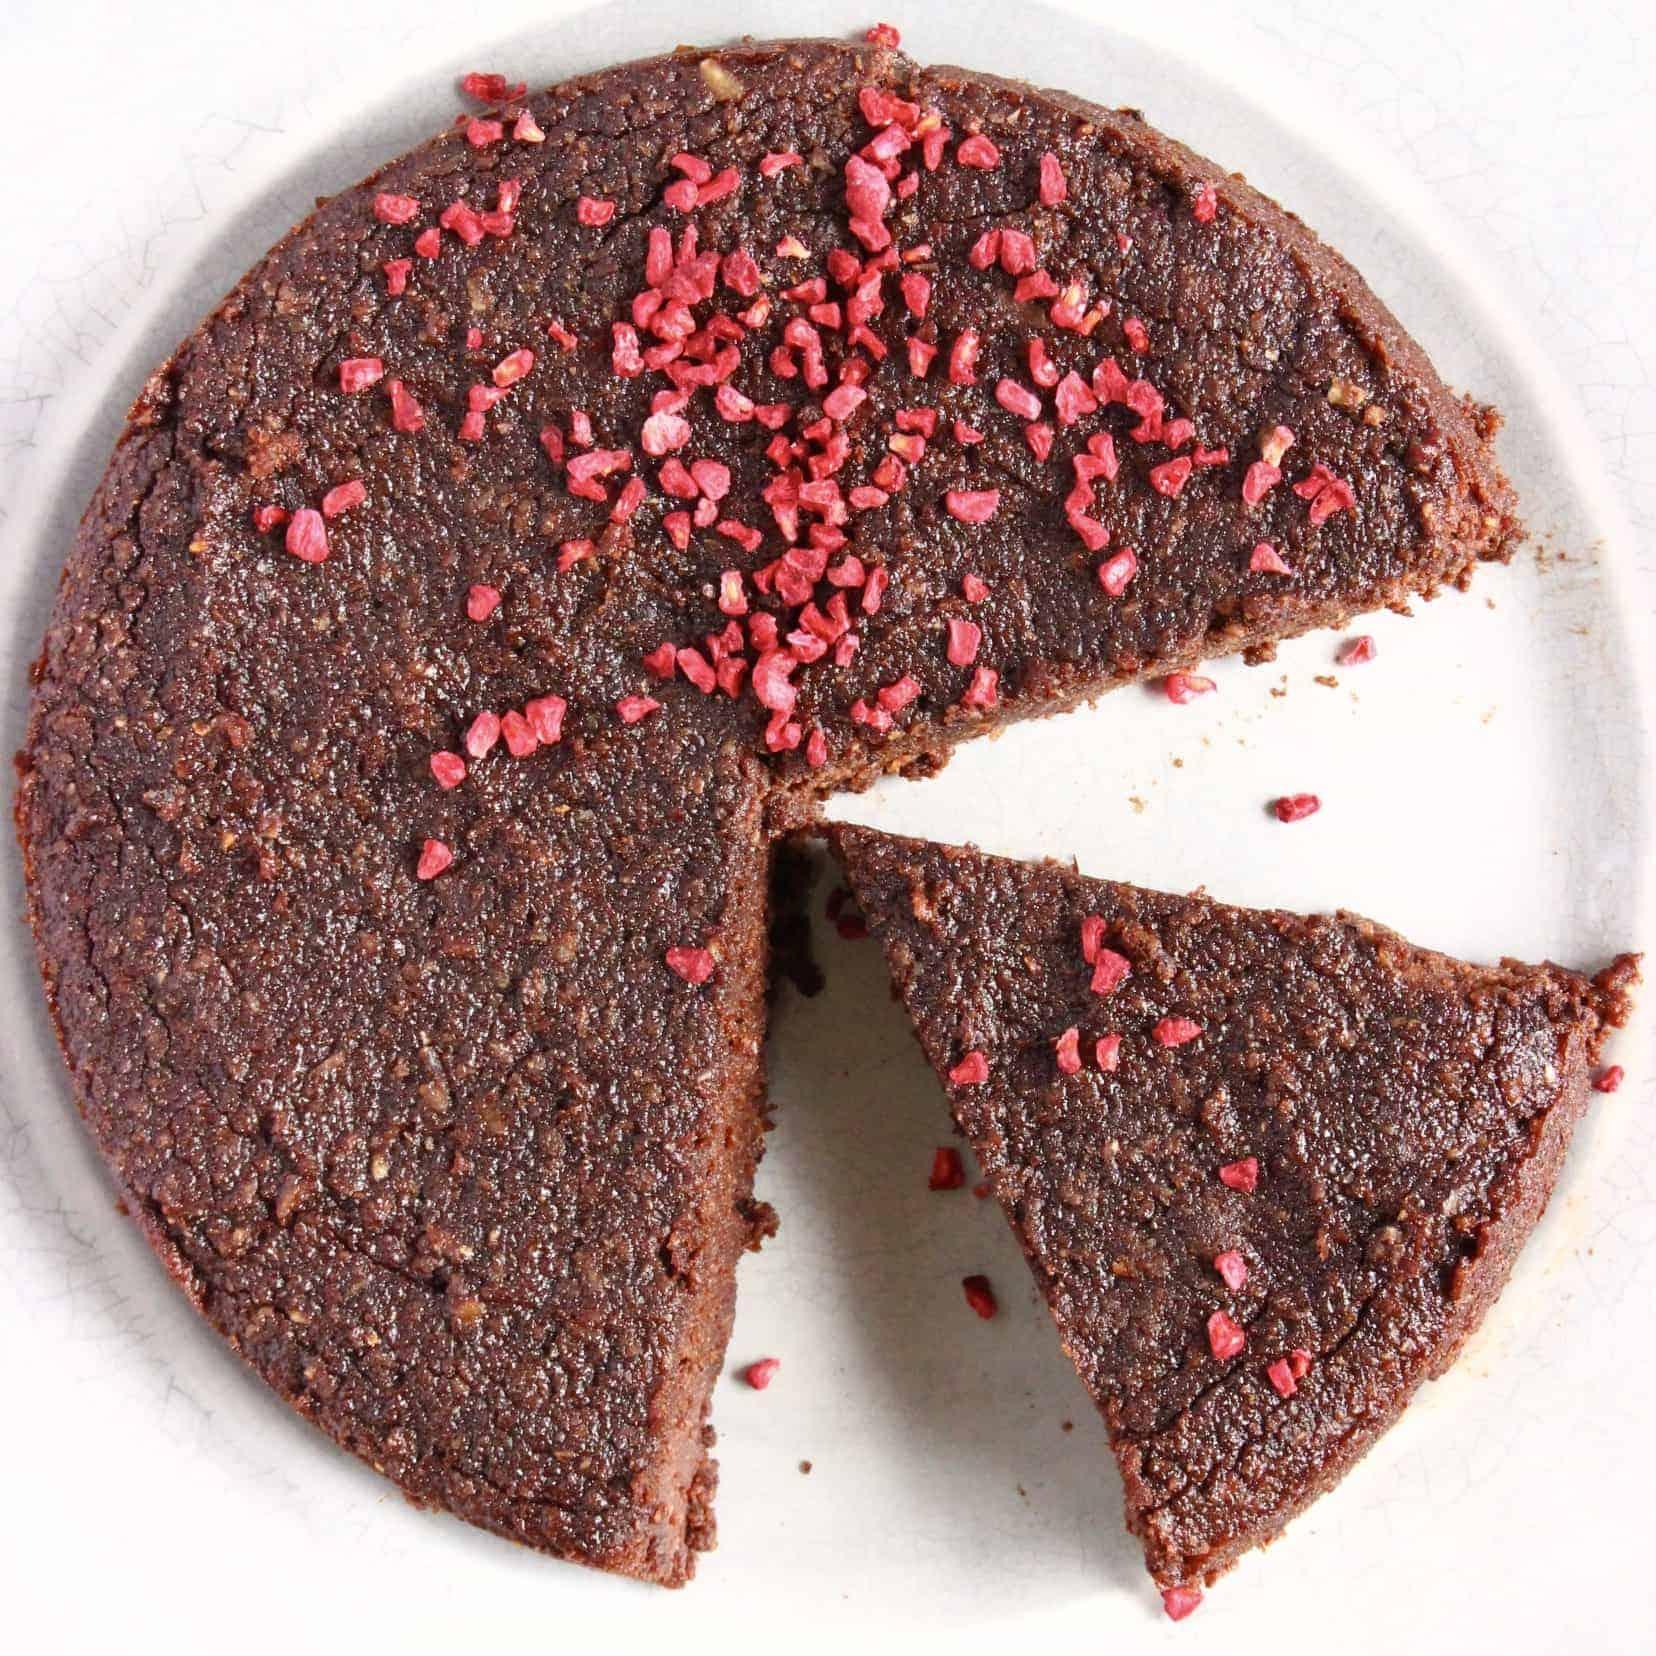 Gluten-Free Vegan Gâteau au Chocolat